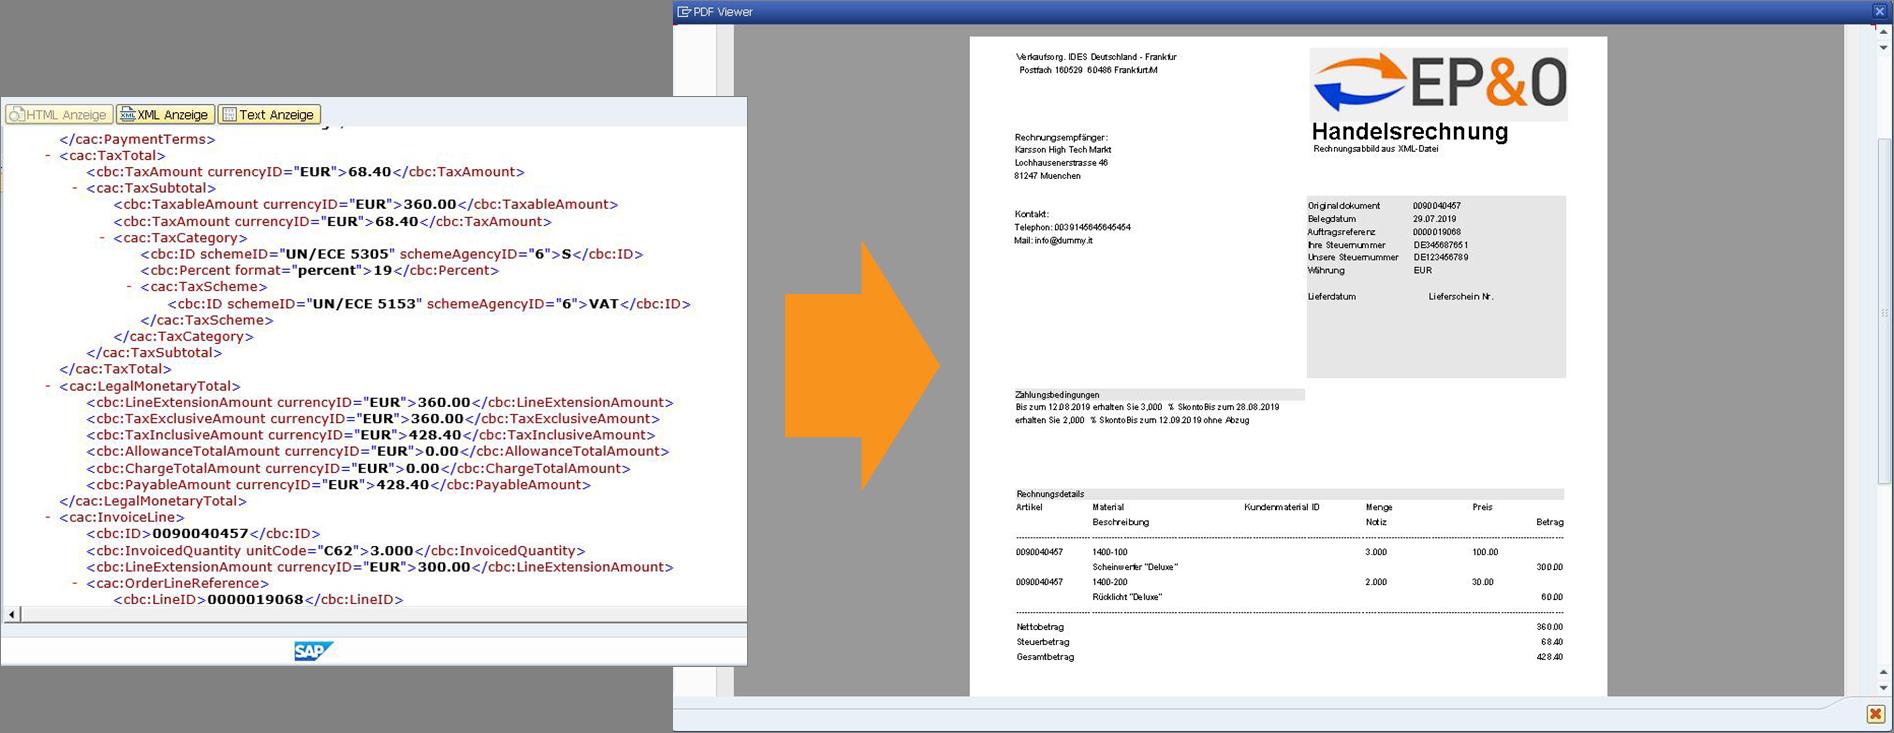 xrechnung_e-rechnung epo pdf visualisierung